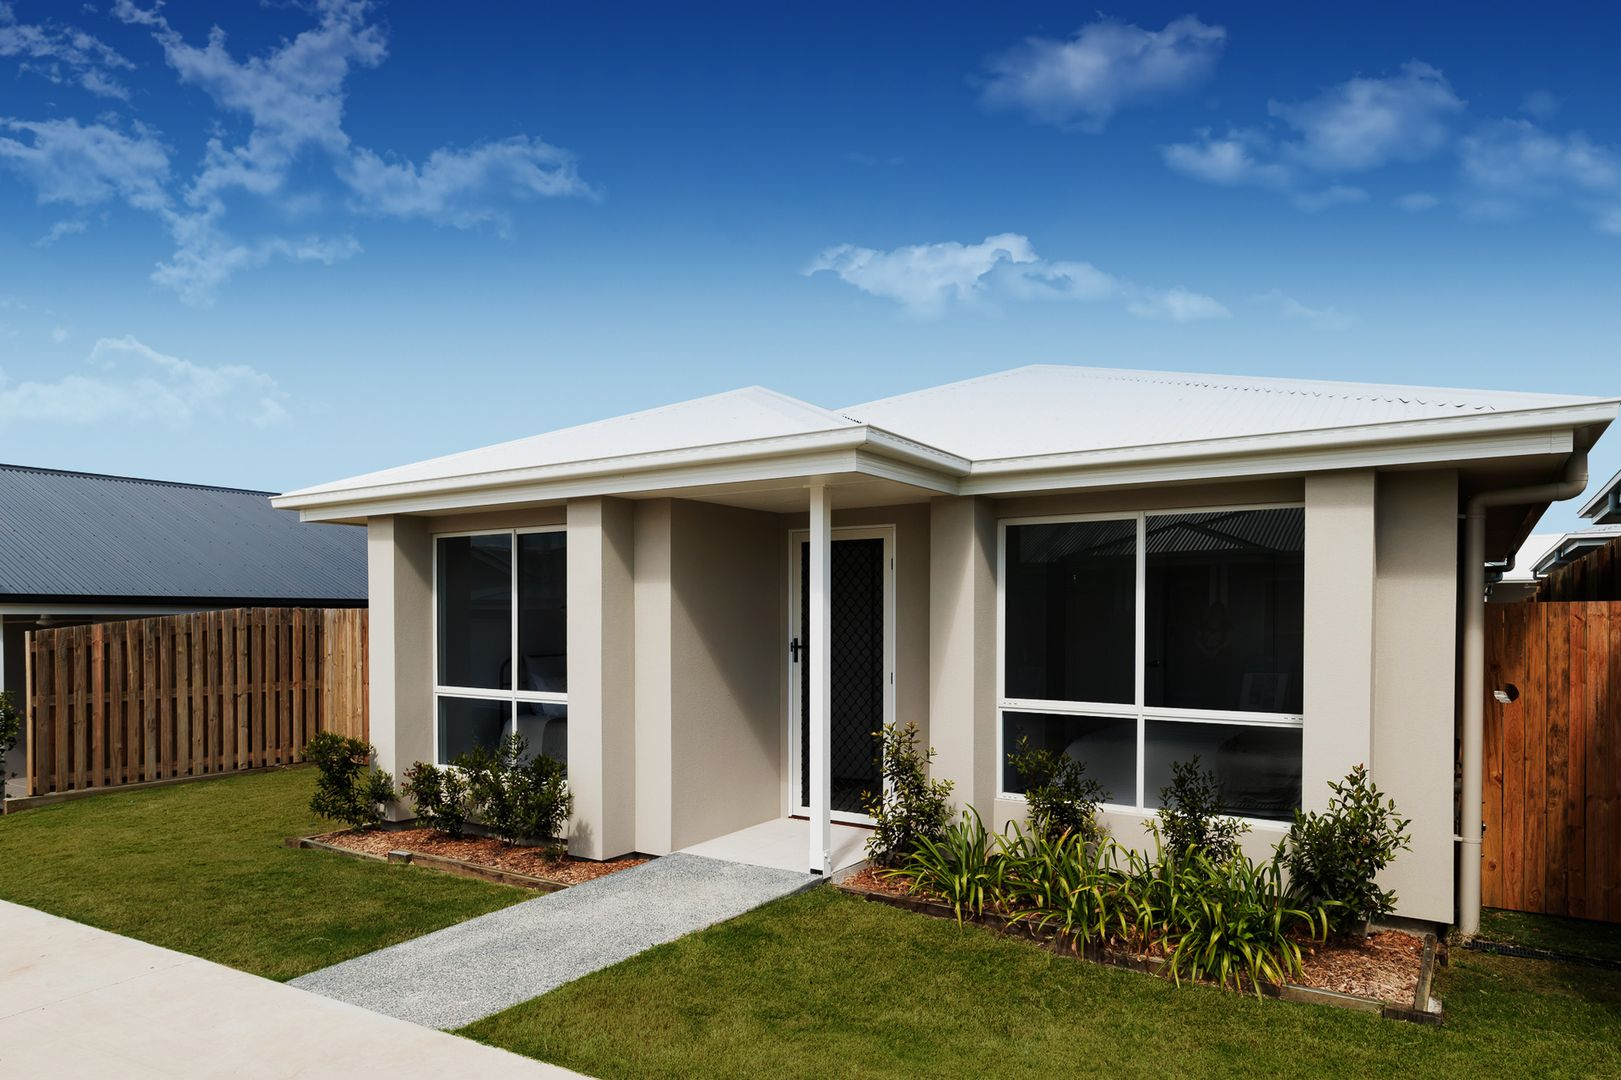 80/2 Koplick Road, Chambers Flat QLD 4133, Image 0